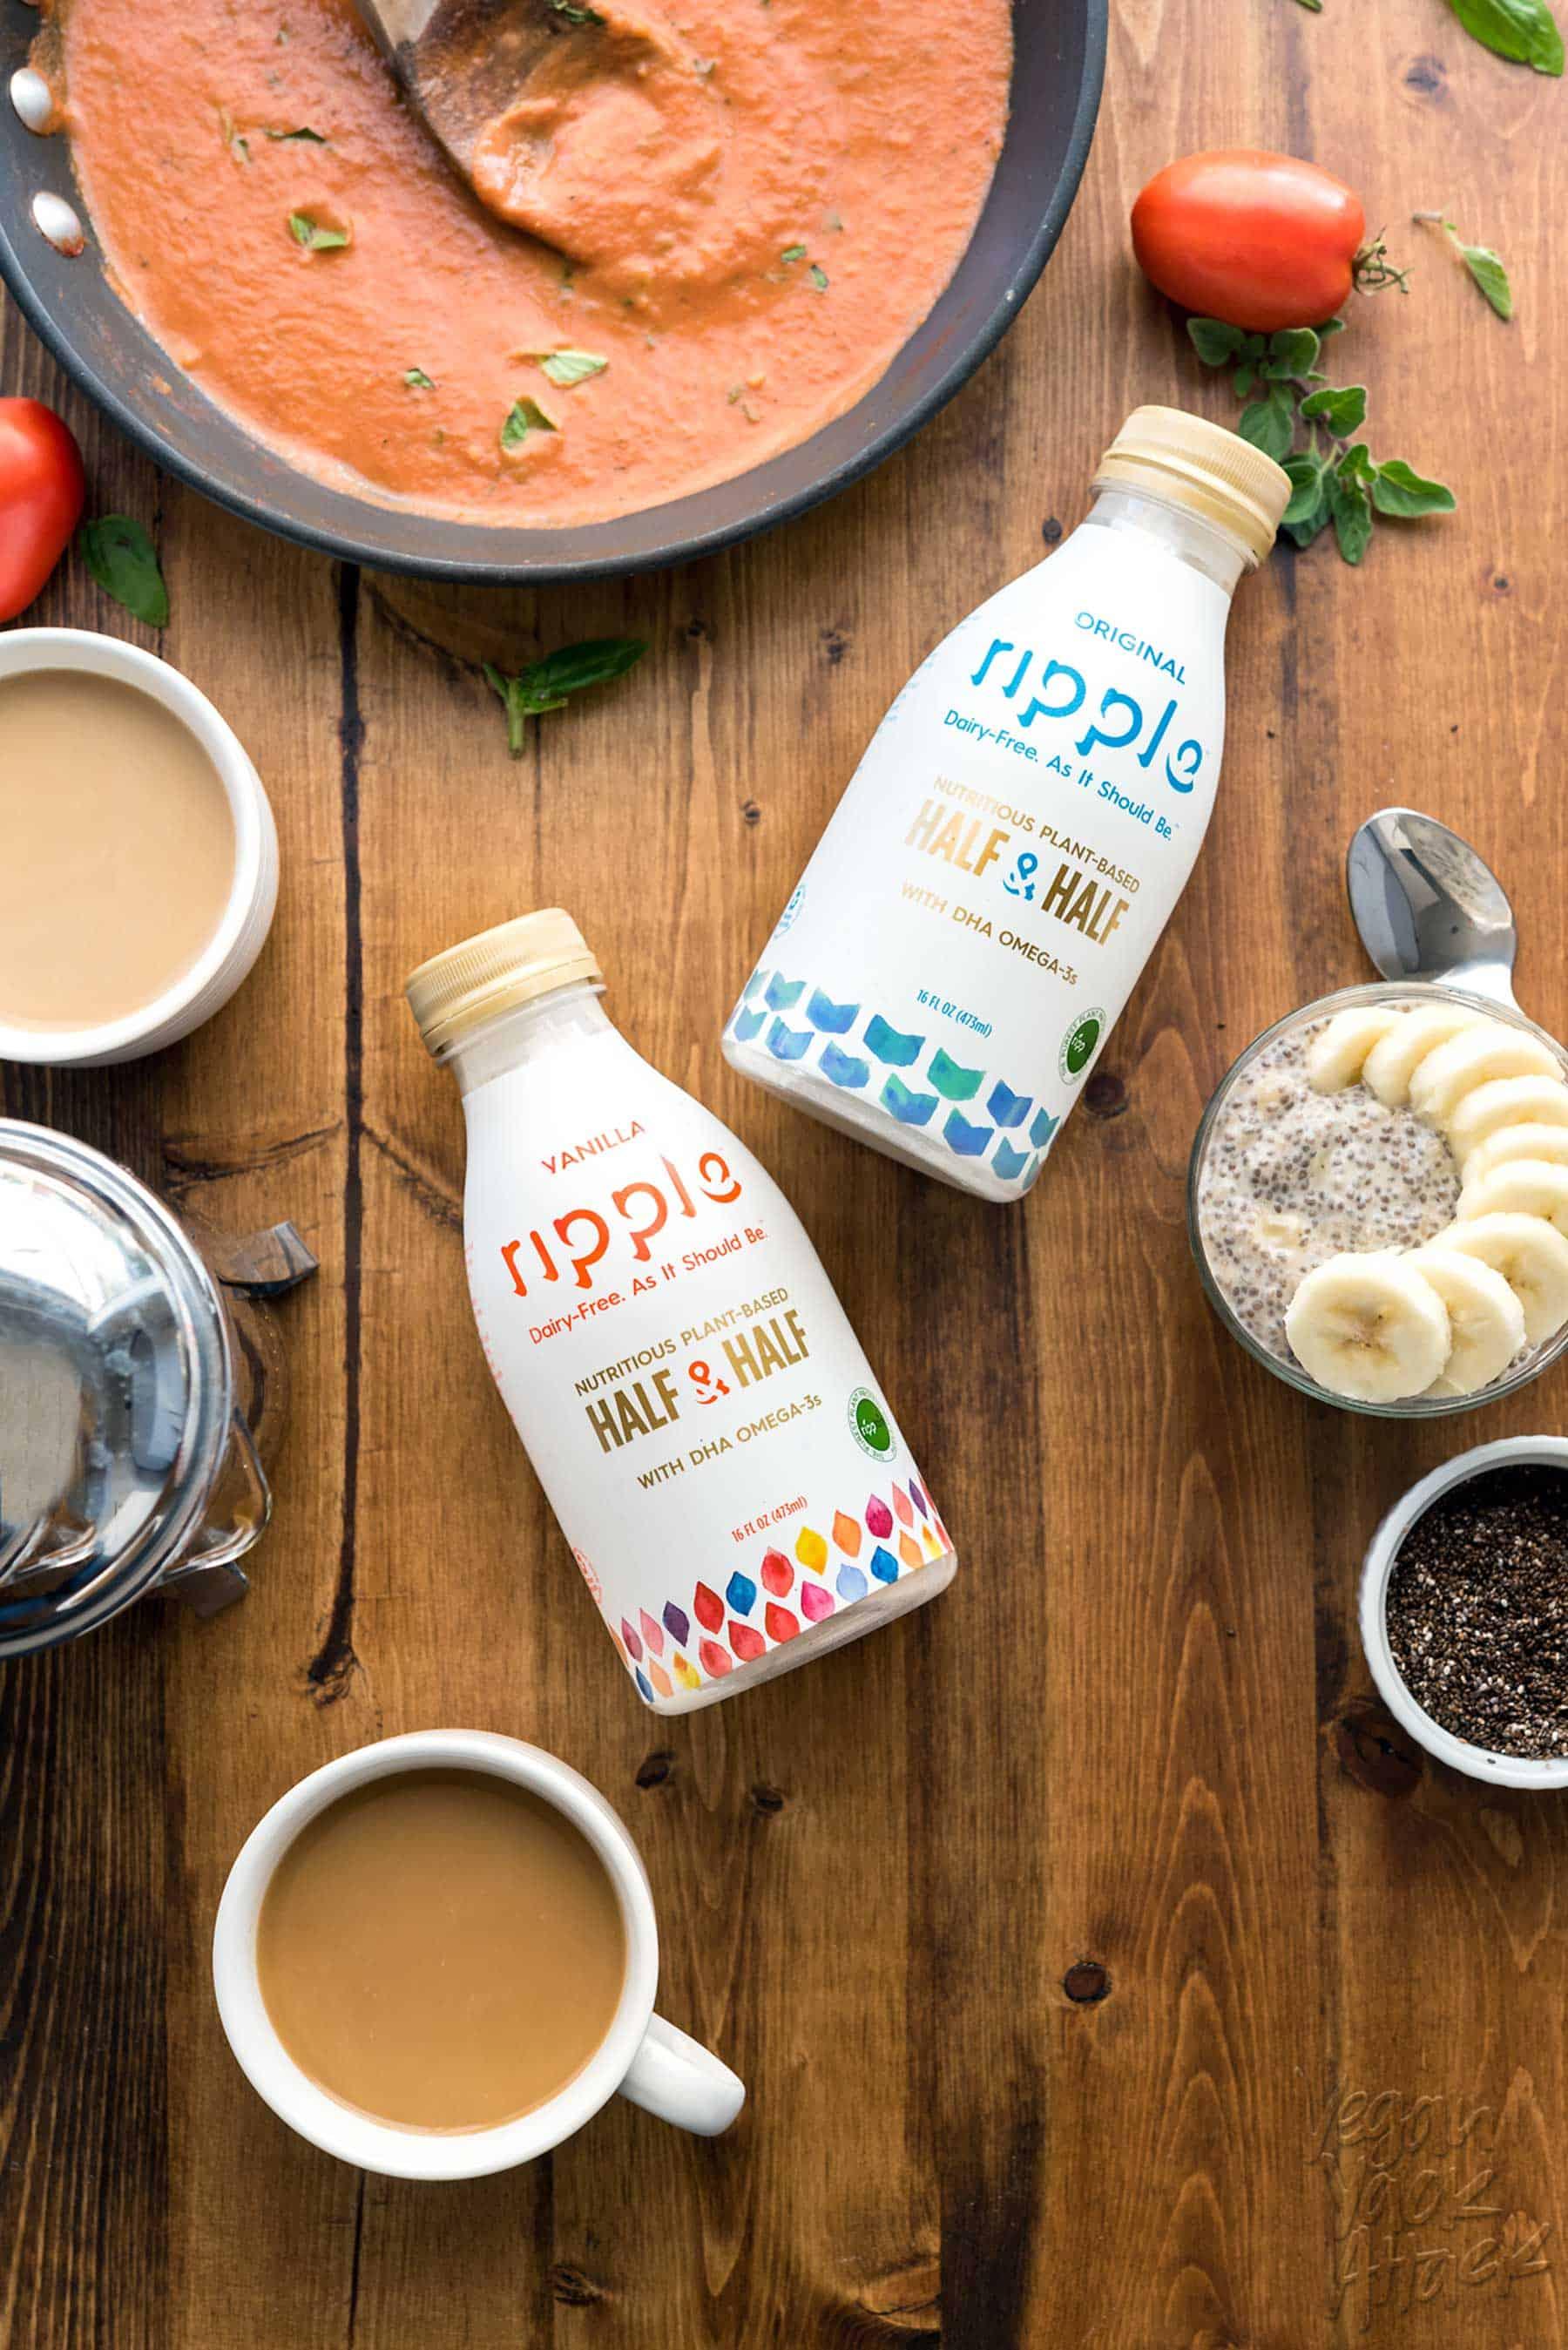 New Vegan Product Review: Ripple Half & Half! Silky smooth, ultra creamy, and versatile. Allergy-friendly, Nut-free #RippleFoods #DairyFreedom